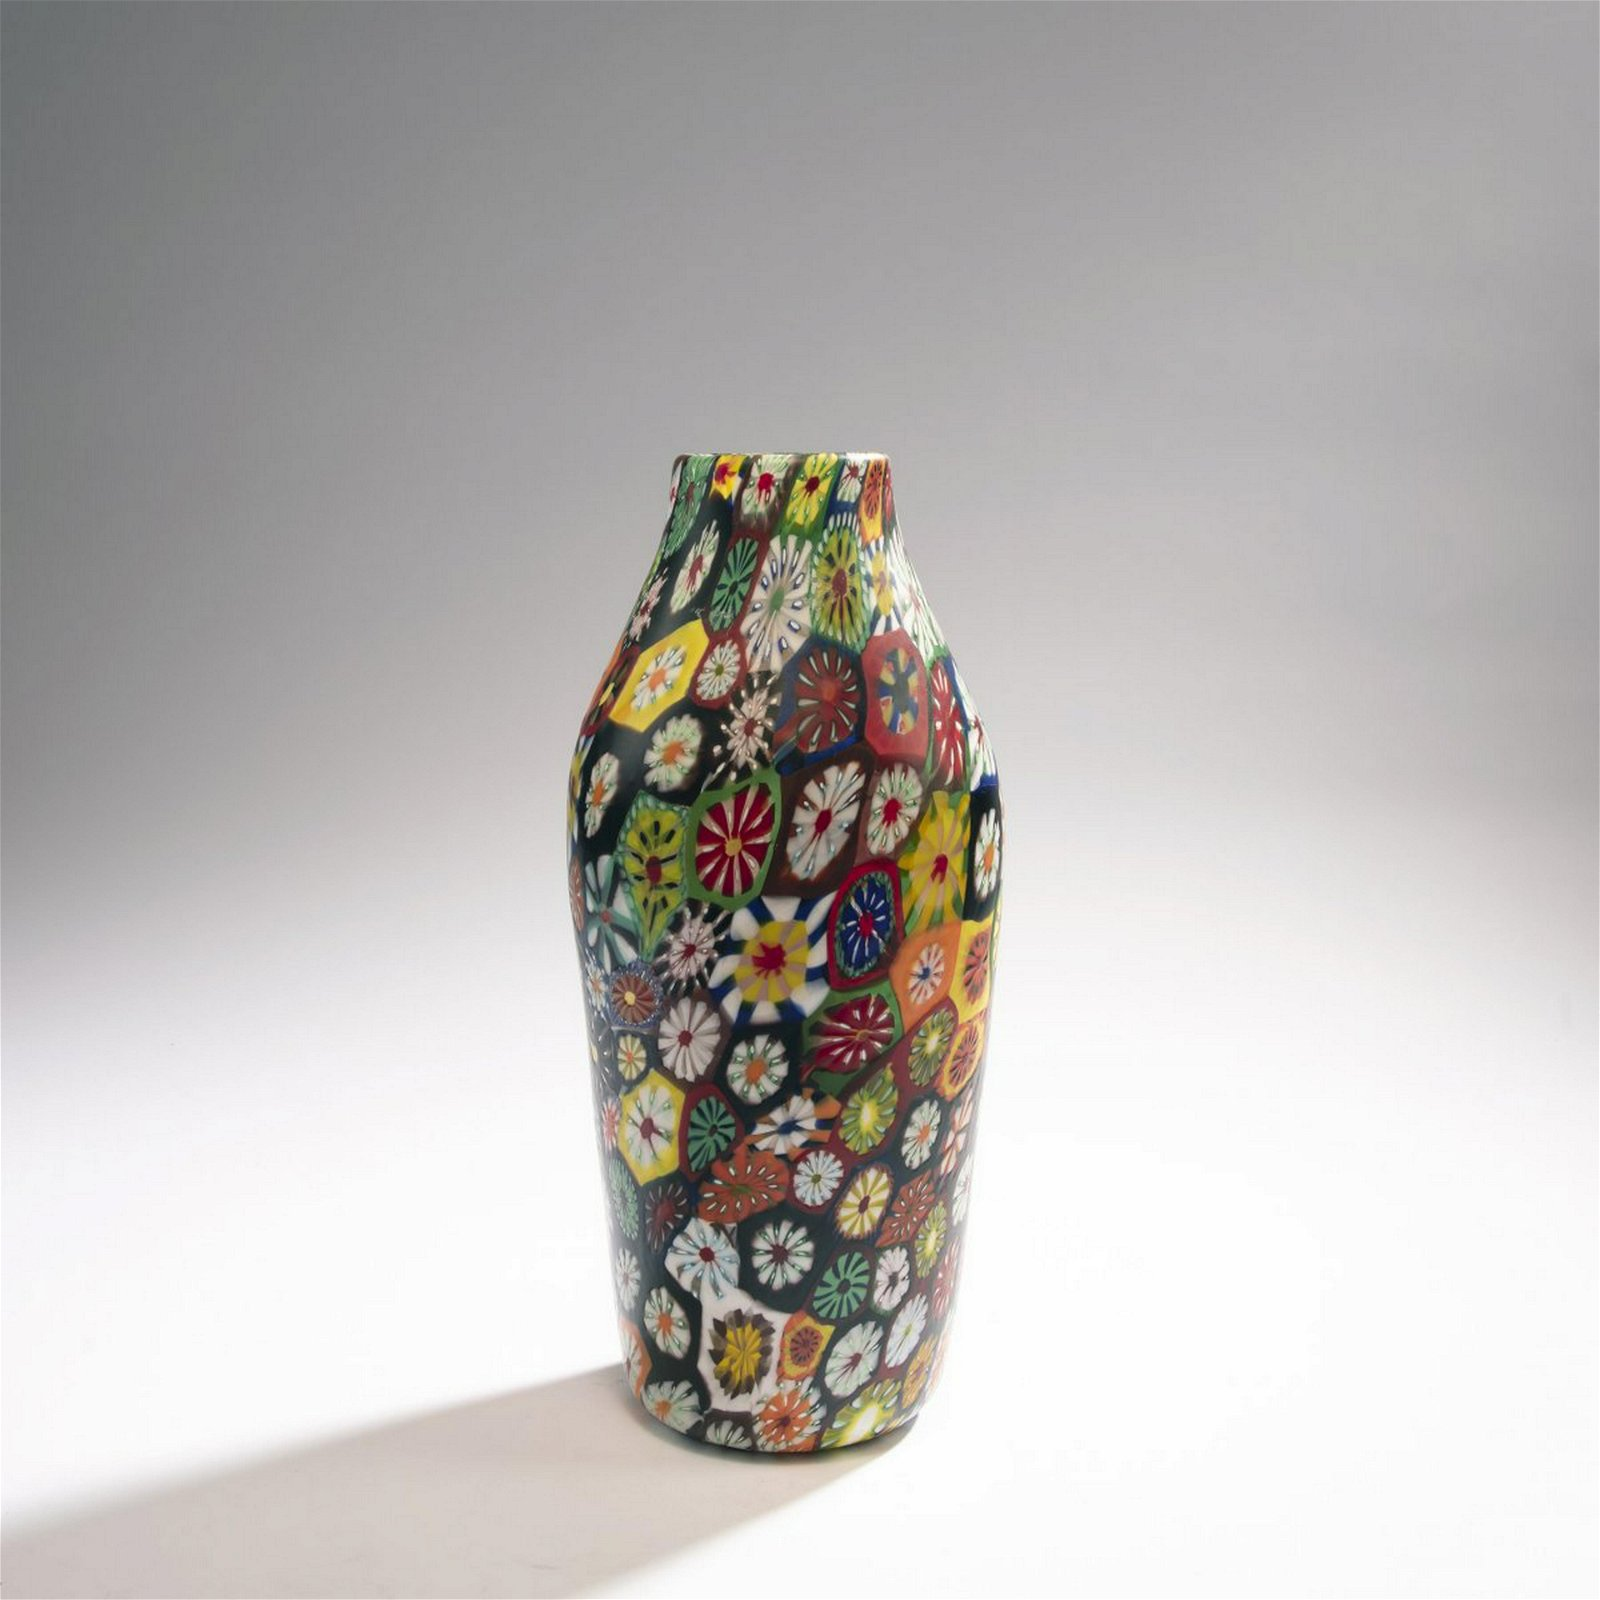 Ermanno Toso, Vase 'A murrine', 1950s